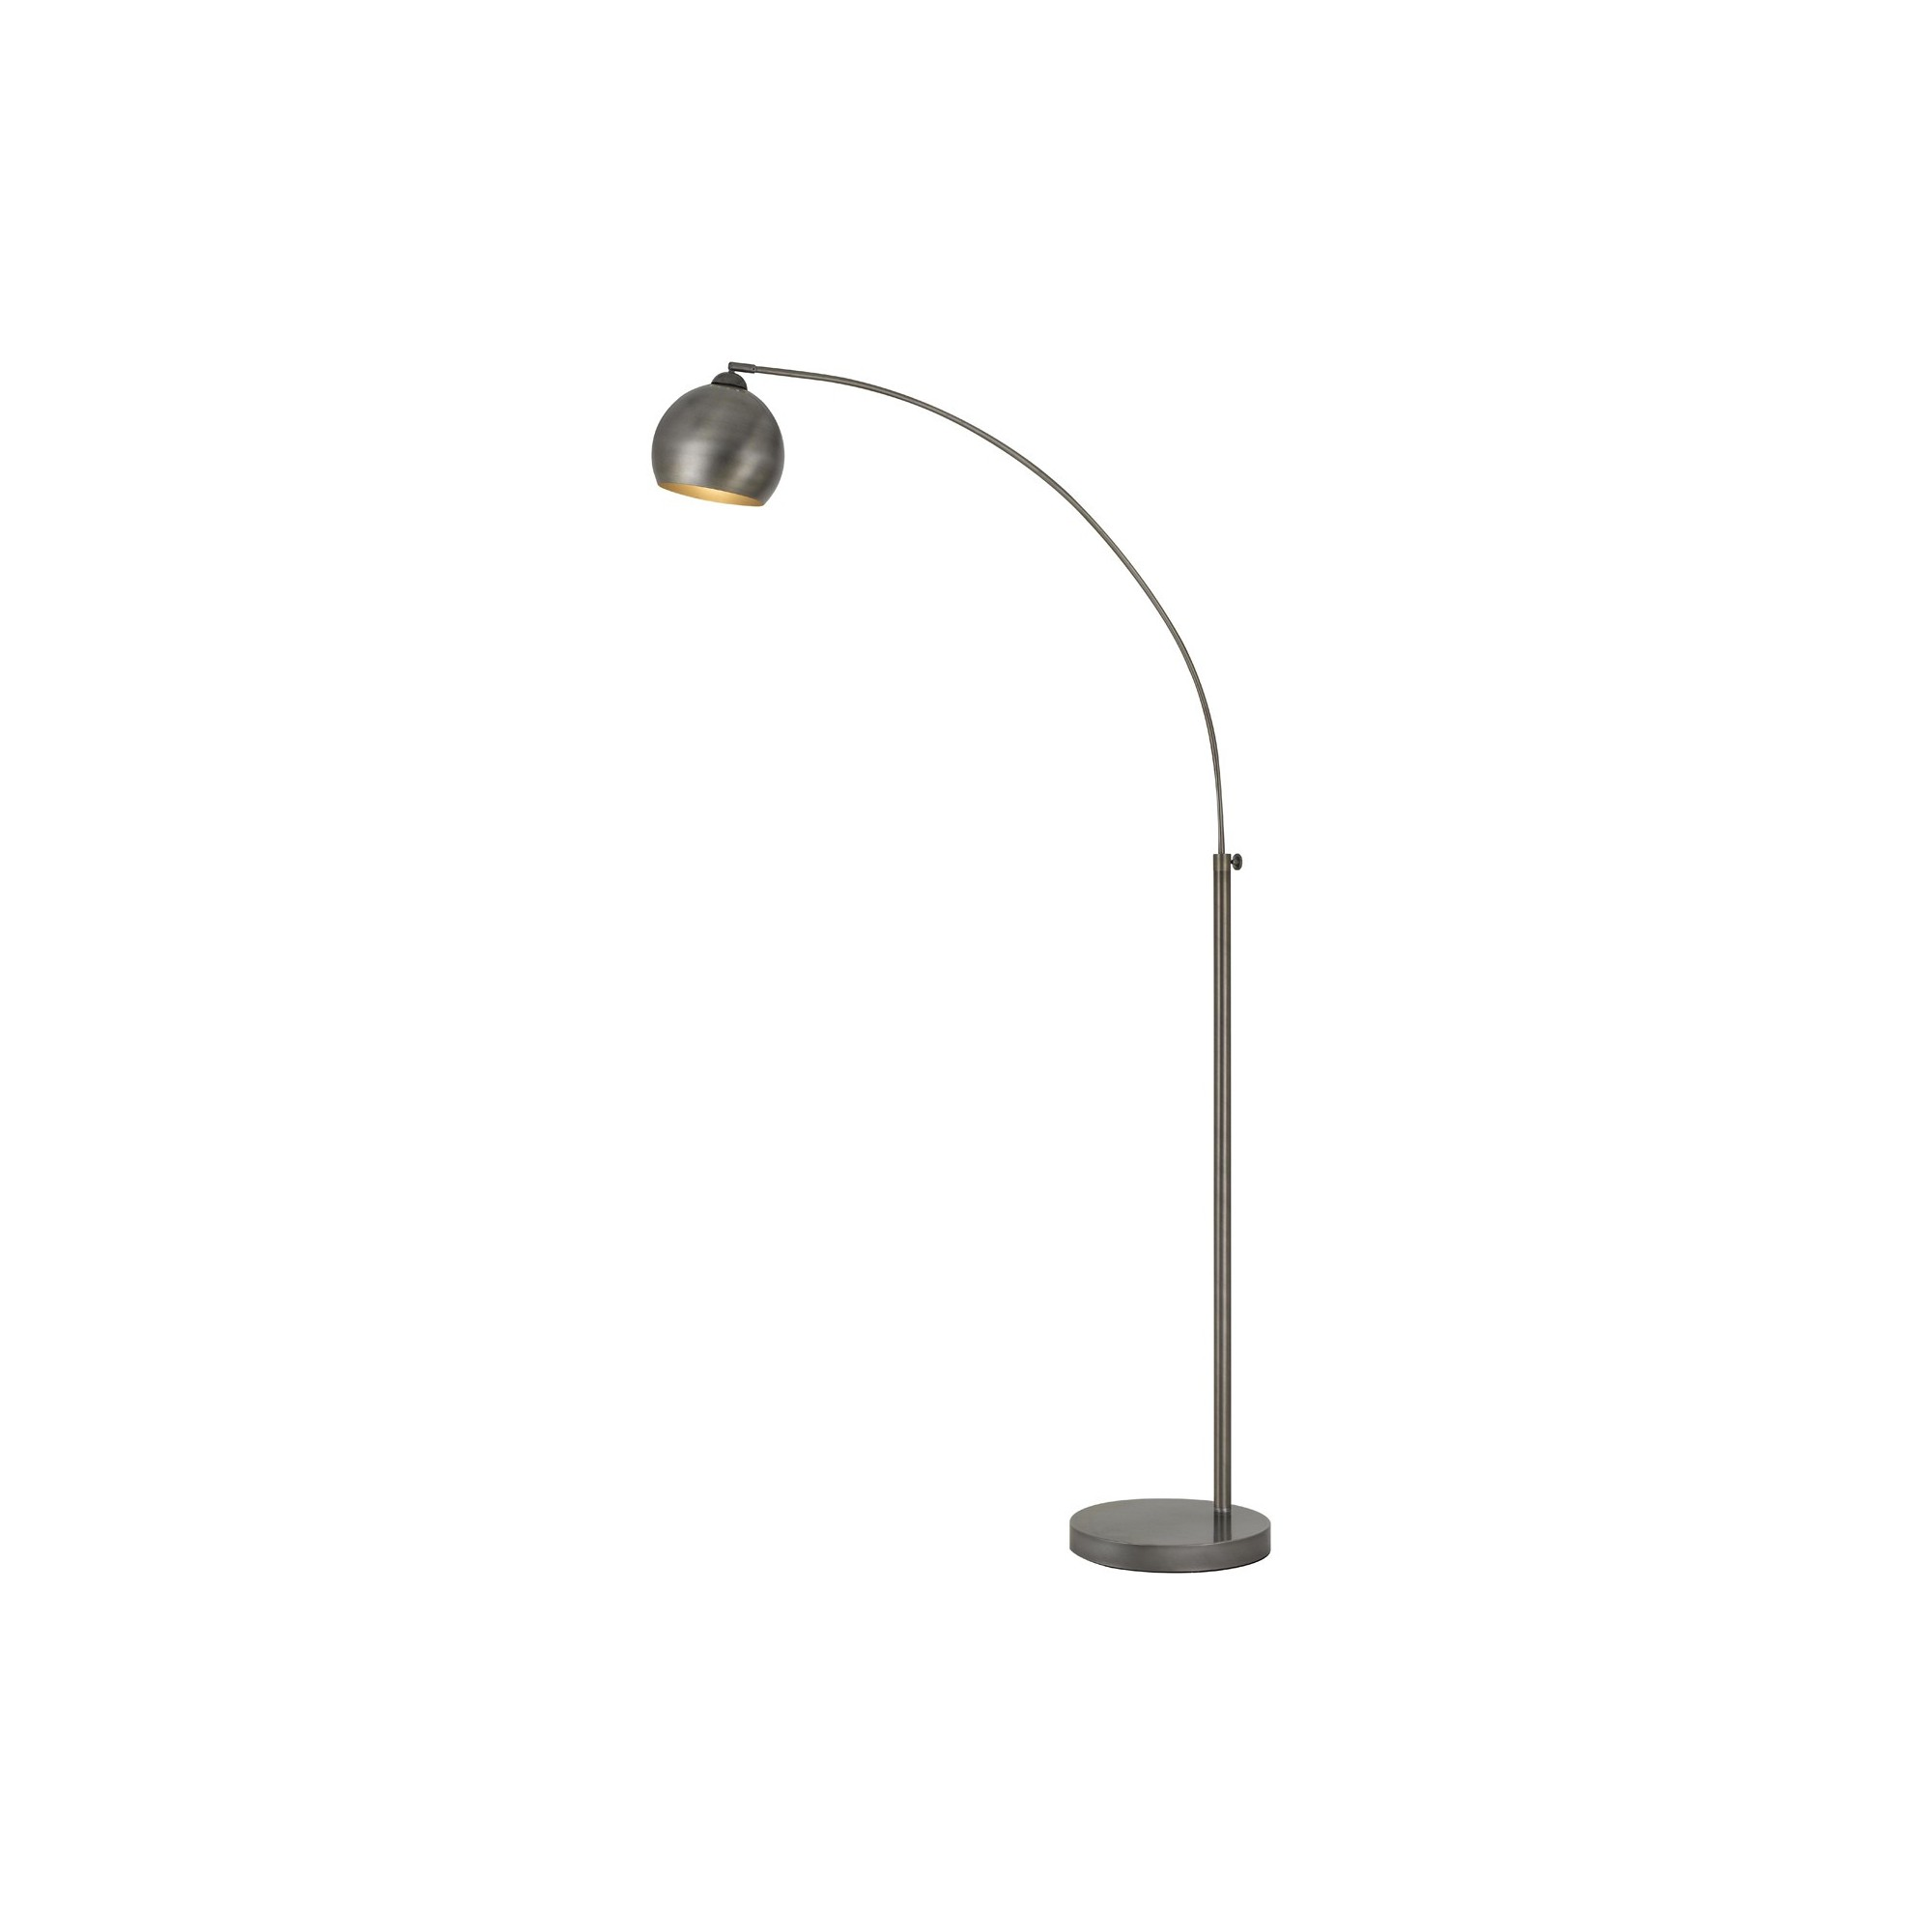 Cal lighting floor lamp cal lighting floor lamp and products floor lamp cal lighting mozeypictures Choice Image